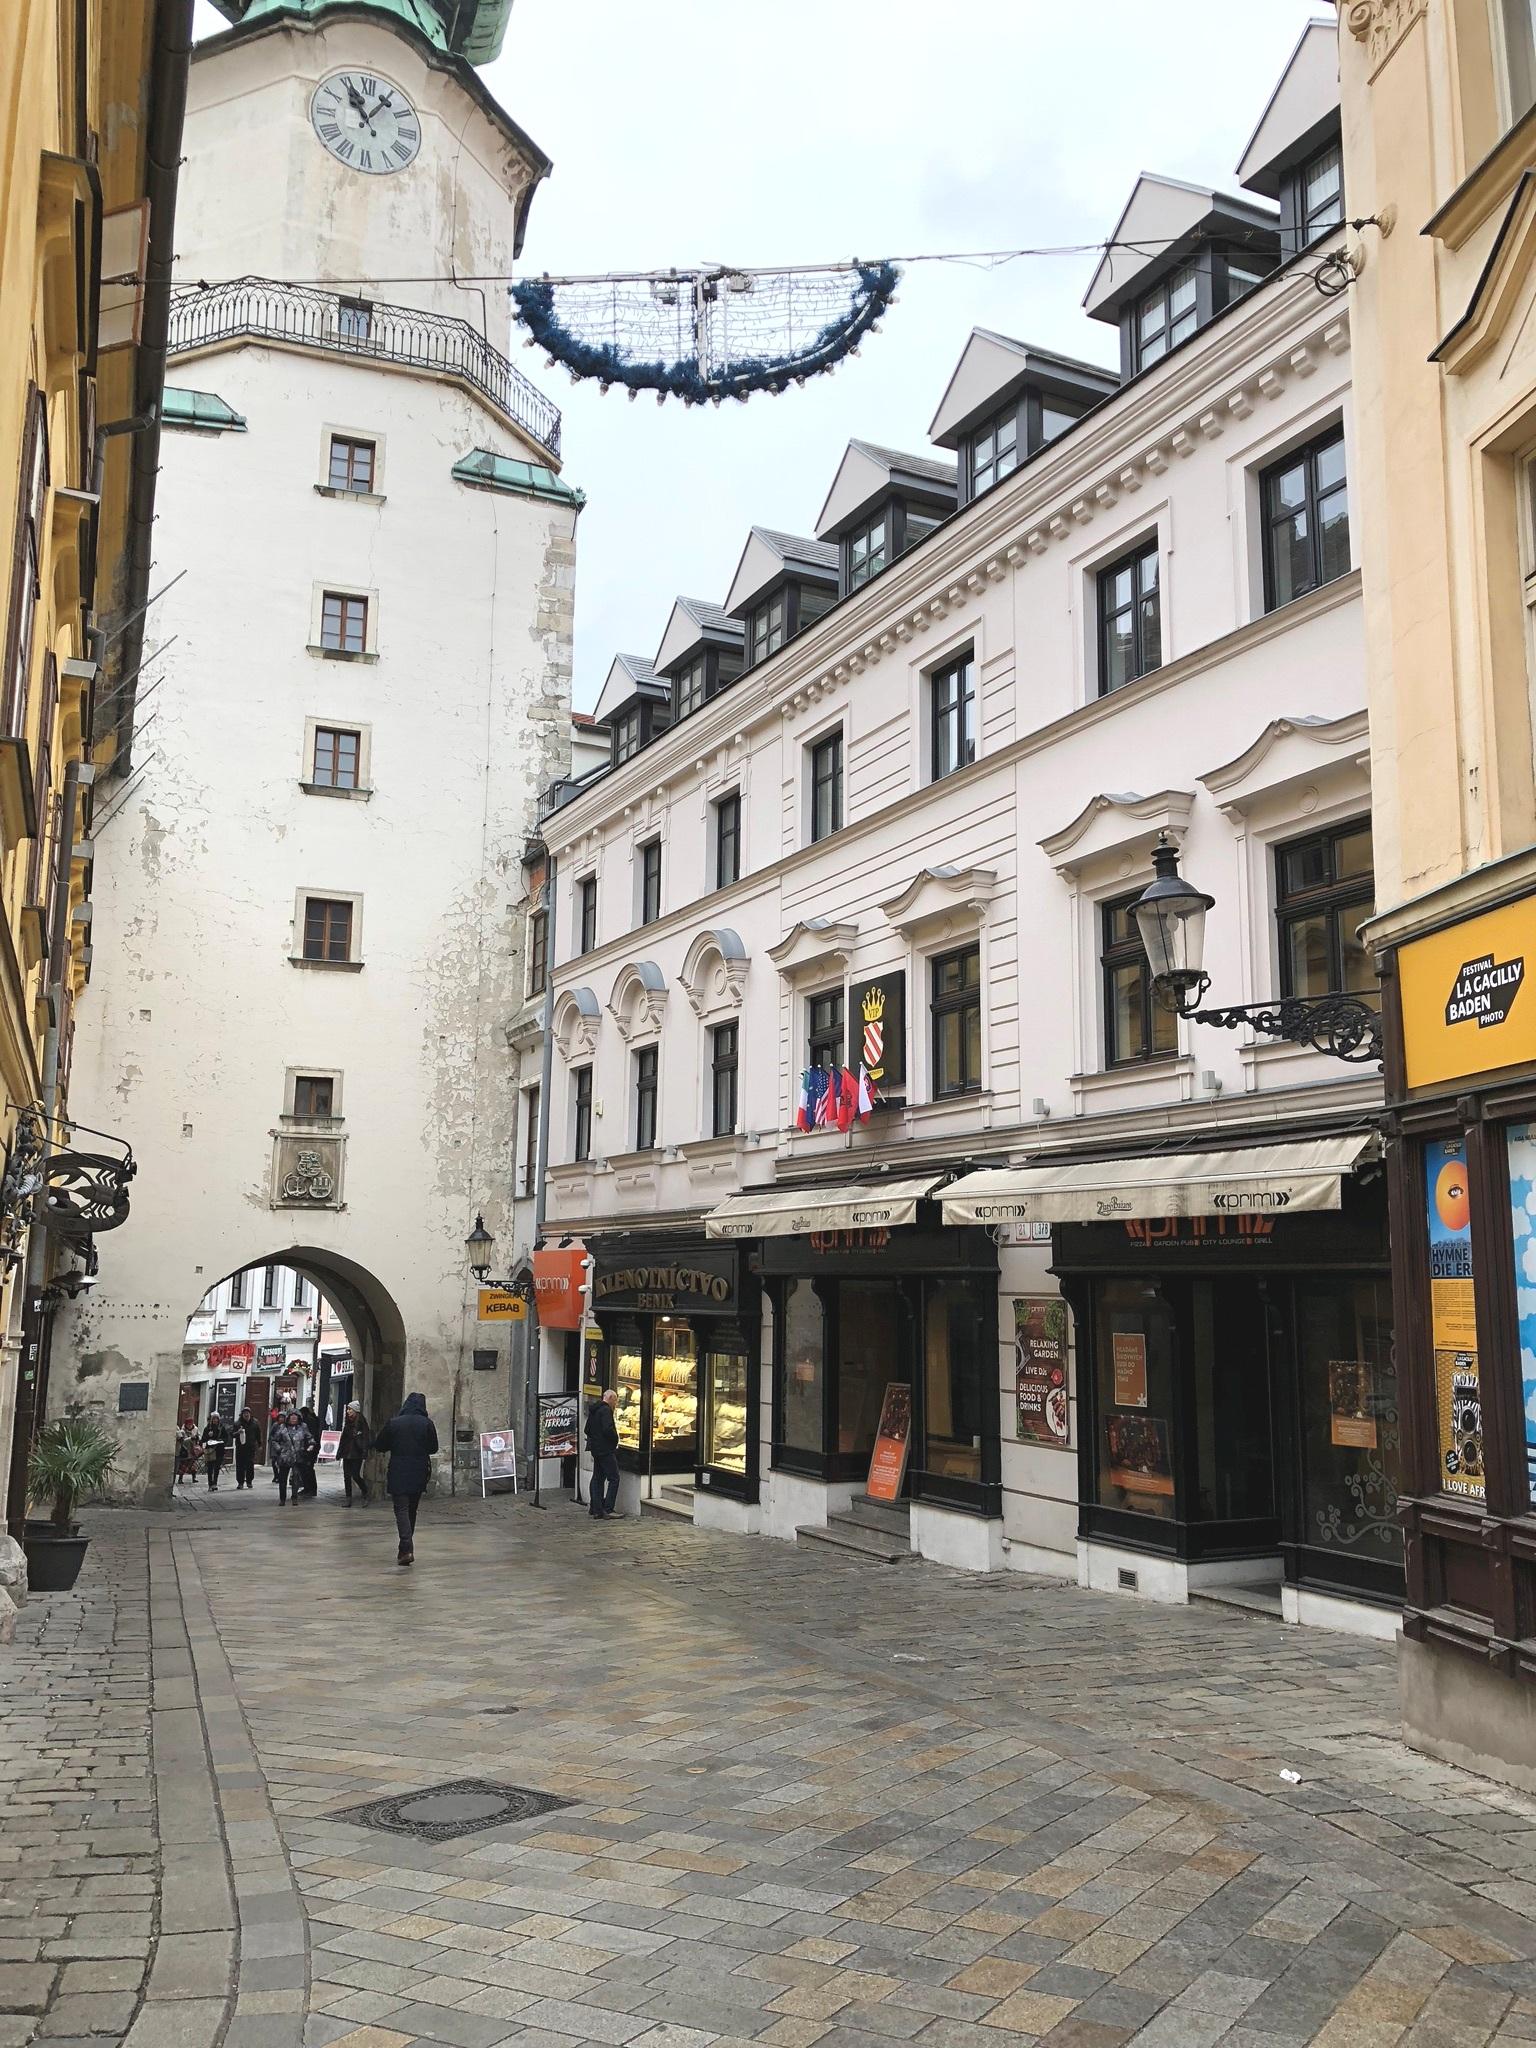 winter travel guide for bratislava, slovakia on livingforaged.com